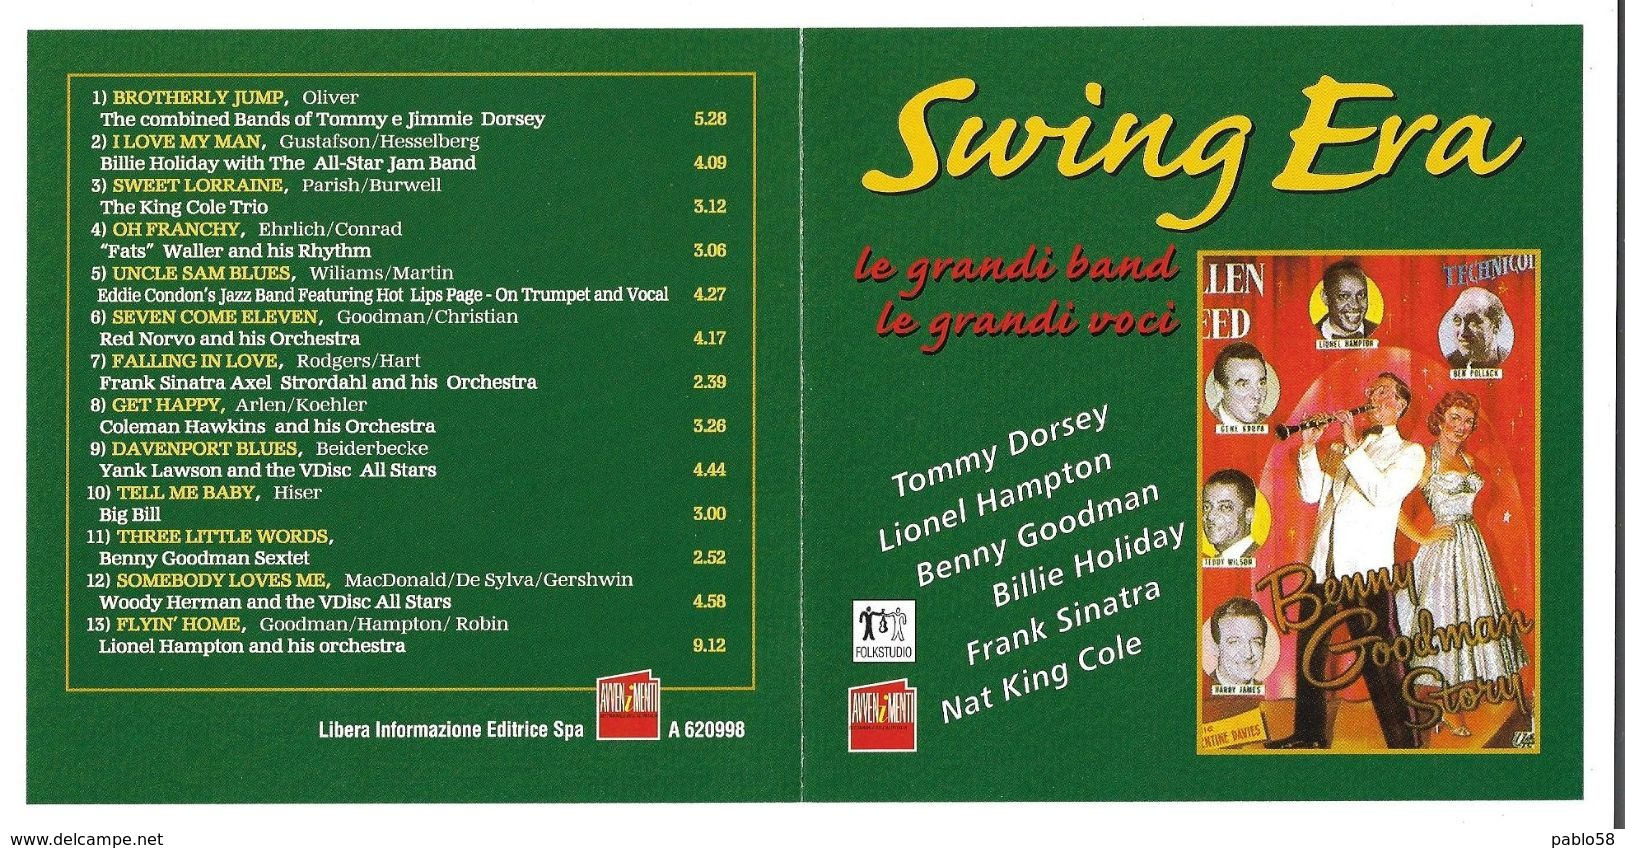 Swing Era Tommy Dorsey - Lionel Hampton - Benny Goodman - Billie Holiday - Frank Sinatra - Nat King Cole - Musik & Instrumente